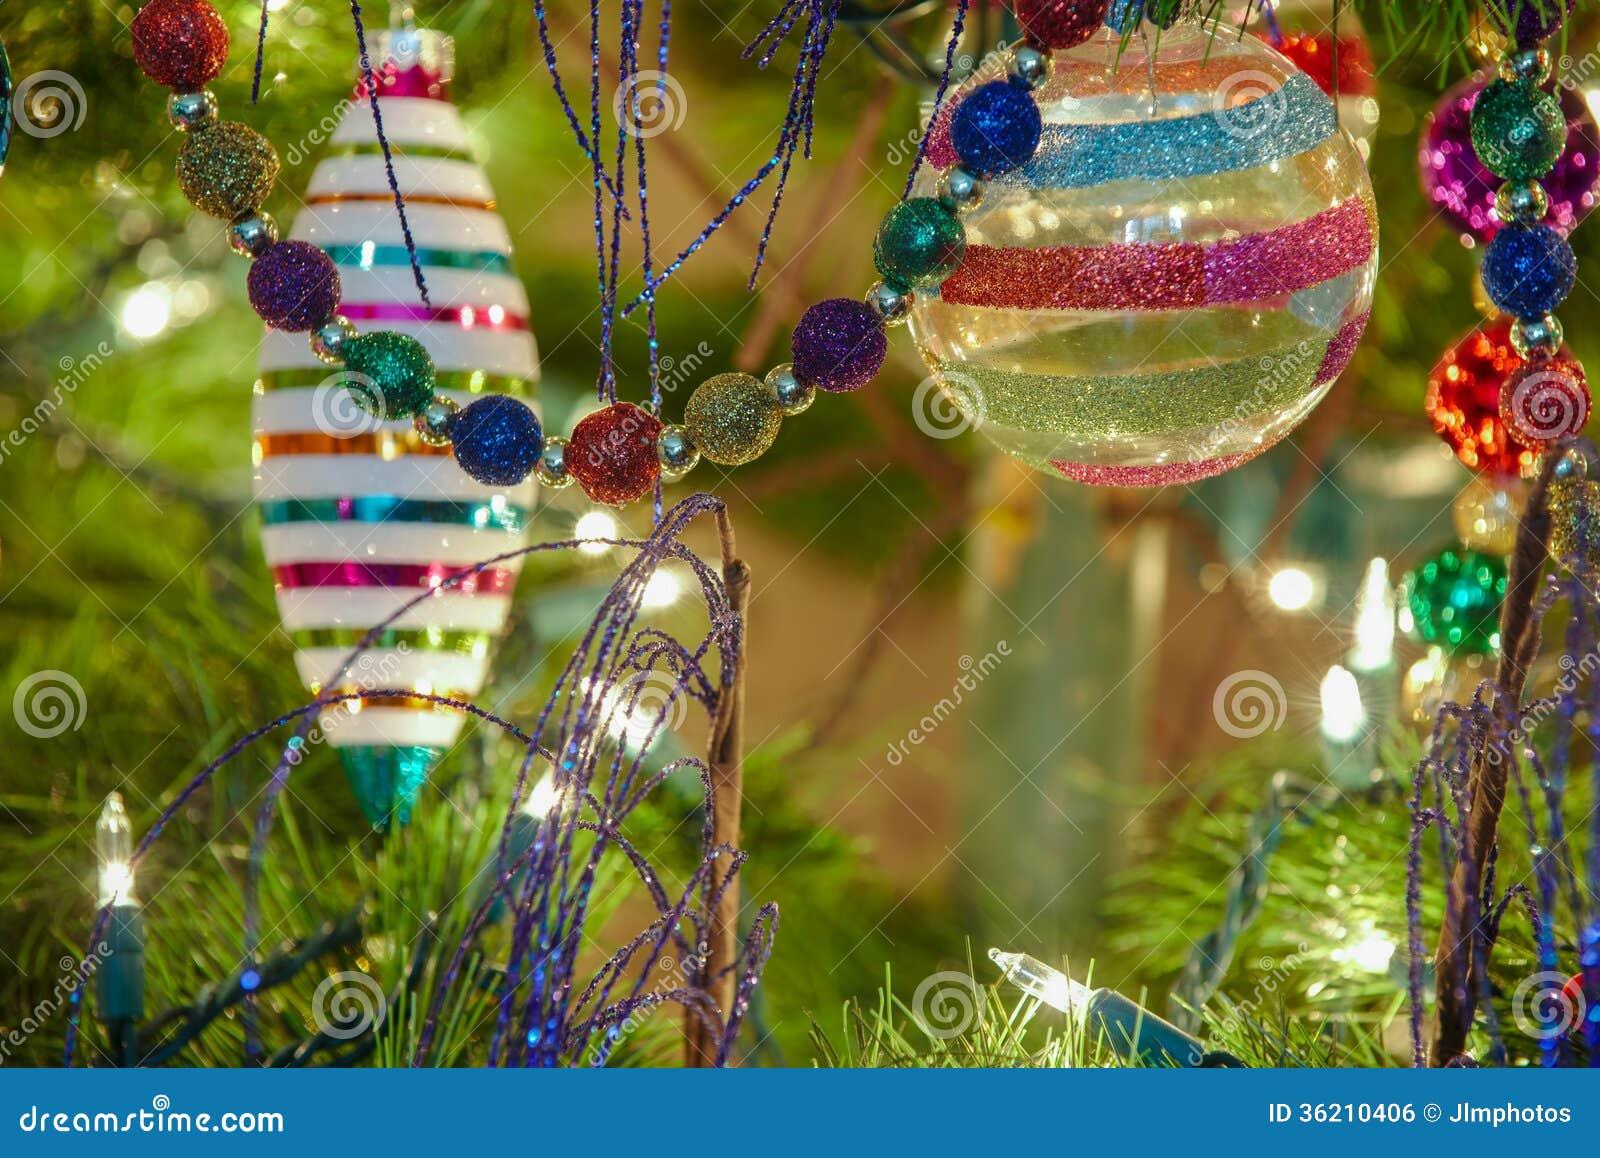 Beautiful glass ornaments - Beautiful Glass Christmas Ornaments